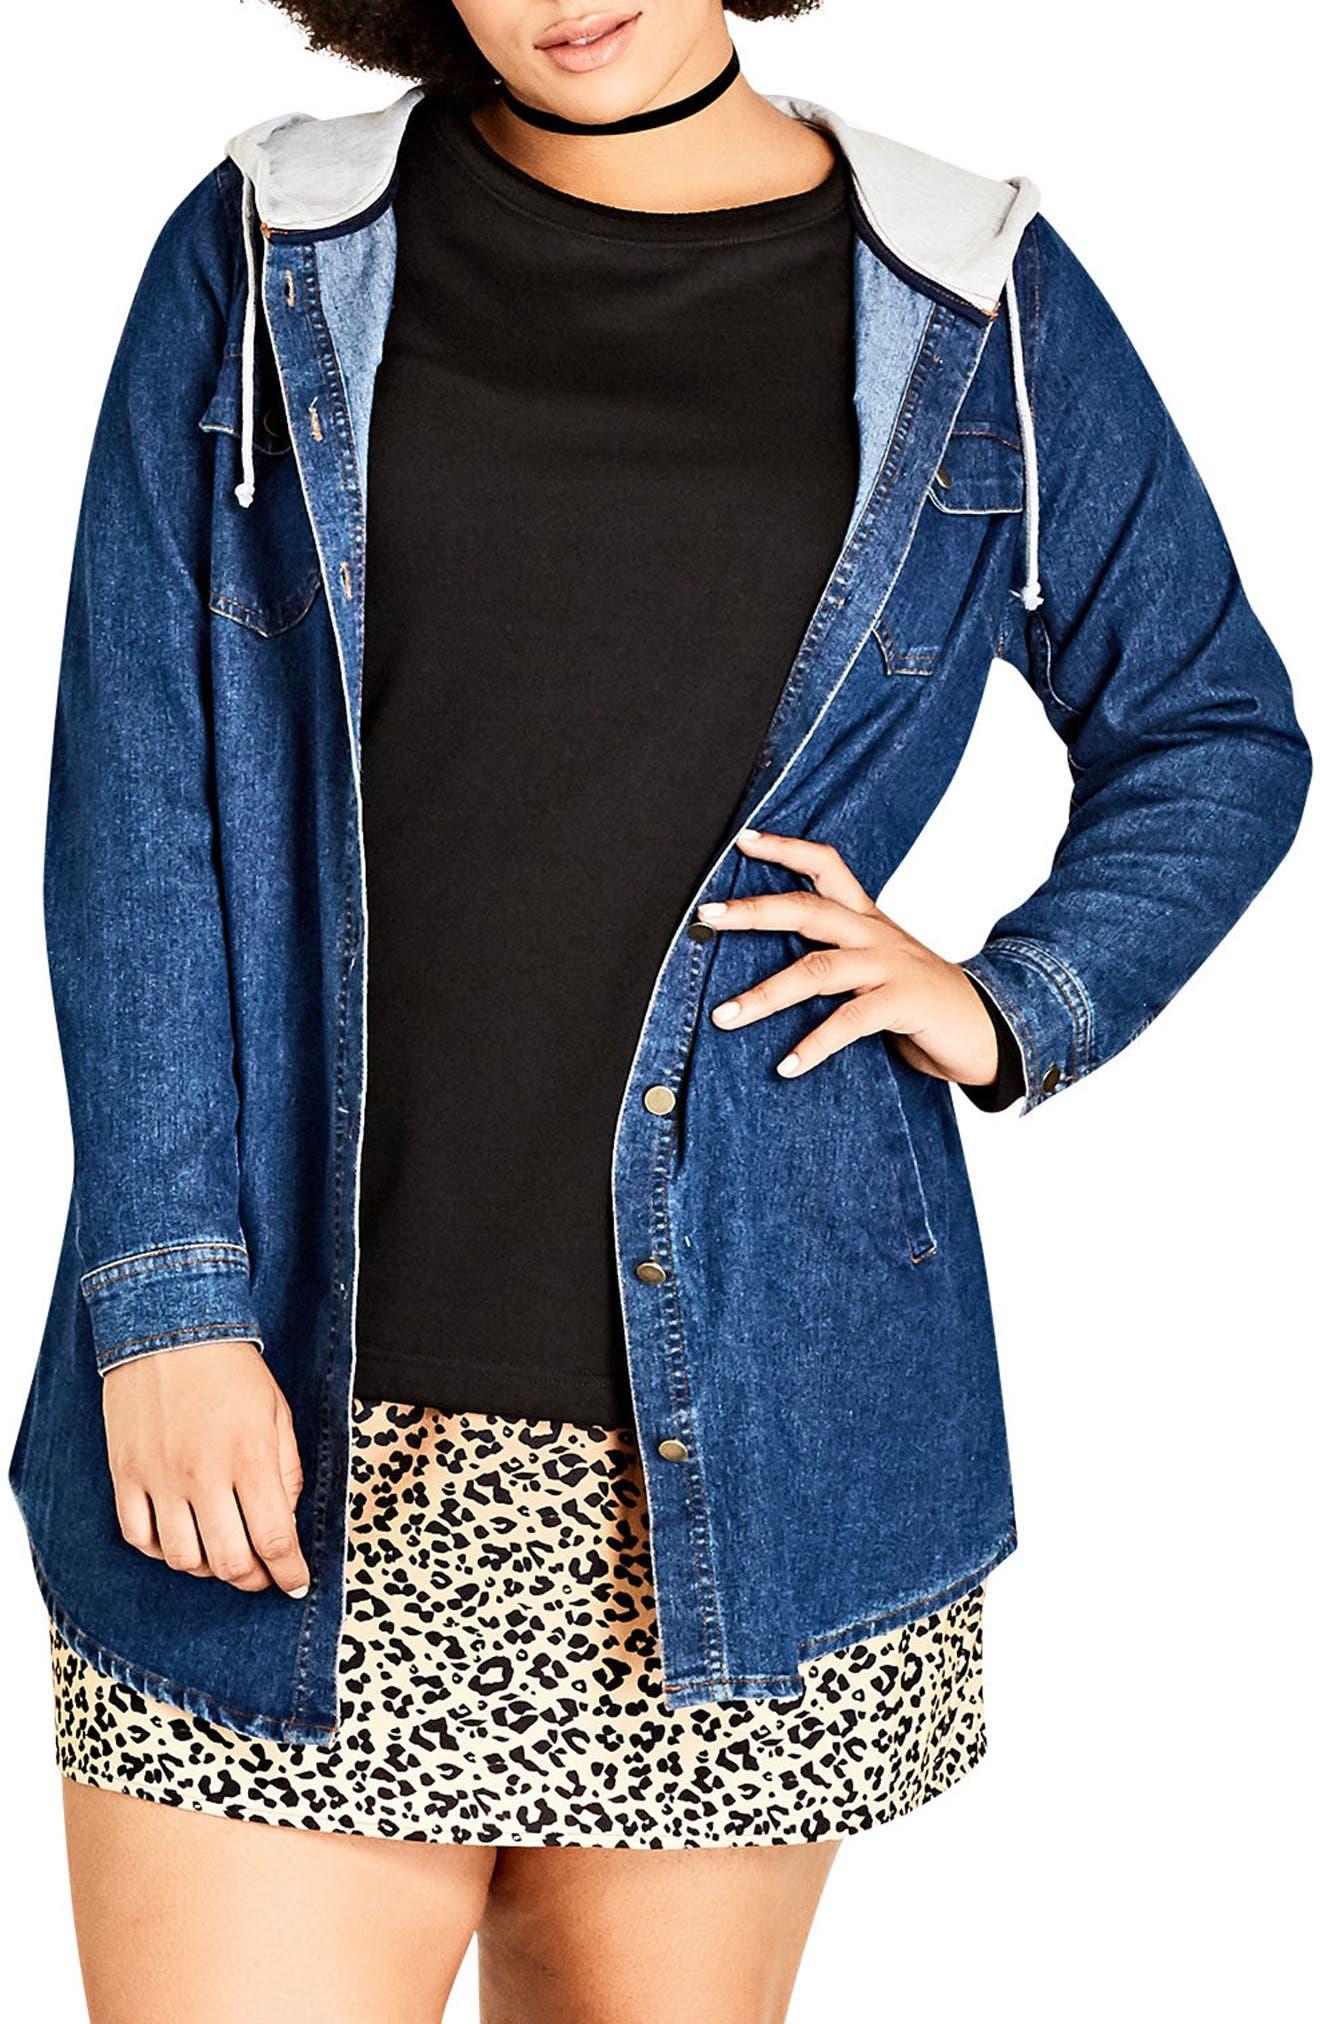 Alternate Image 1 Selected - City Chic Denim Vibe Hooded Jacket (Plus Size)